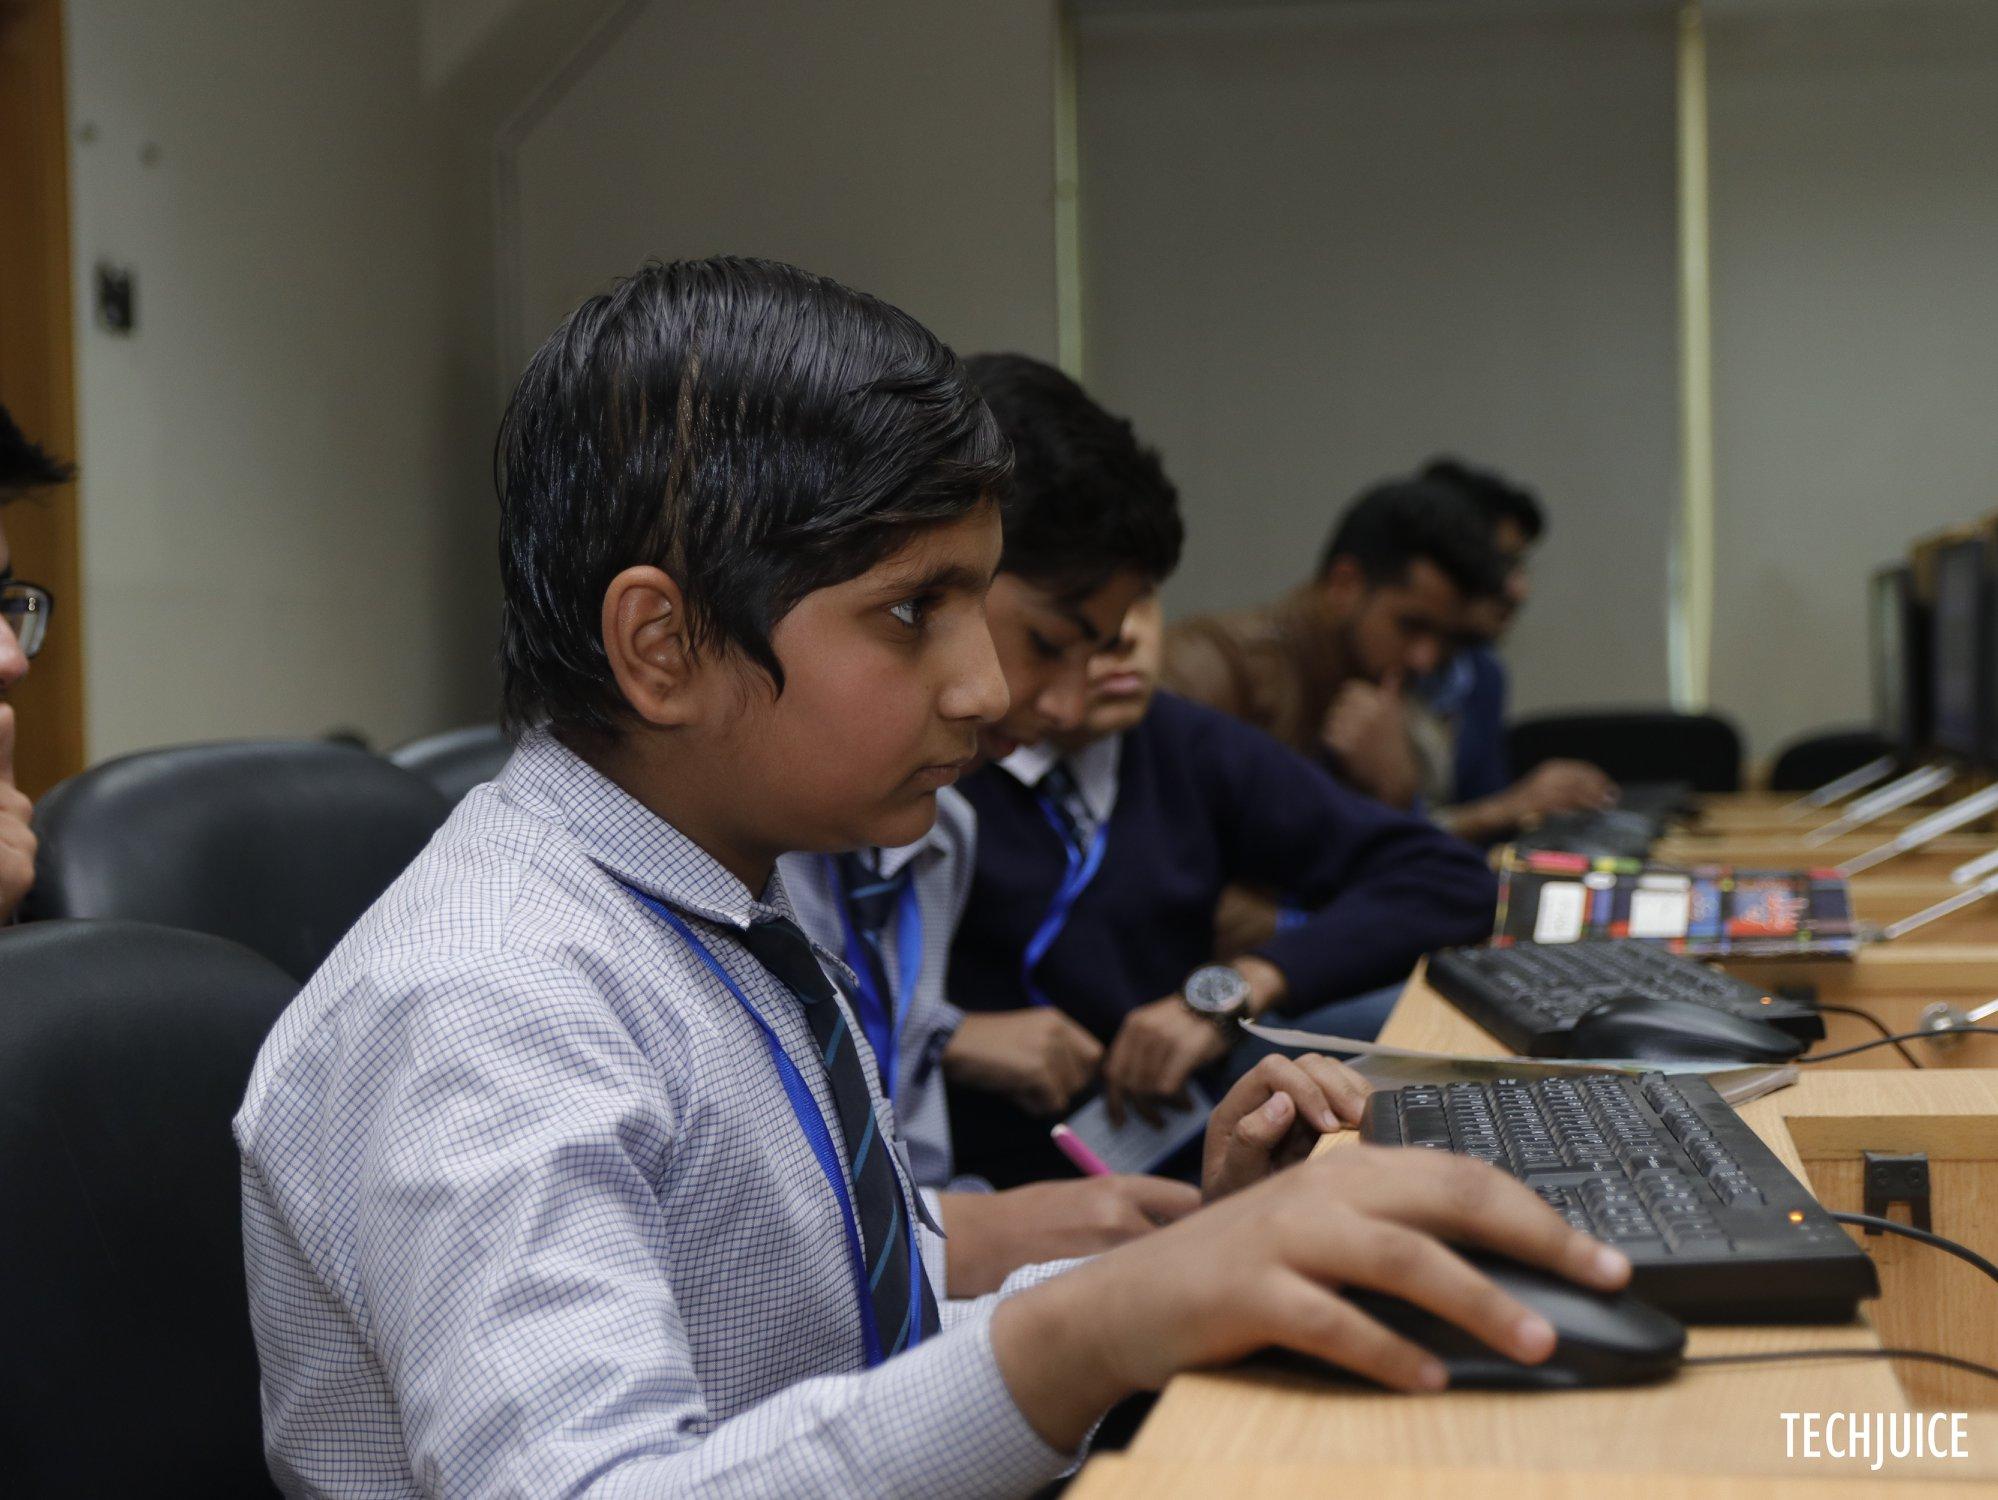 techjuice+ Khud+ bootcamp+ python+ self+ education.jpg